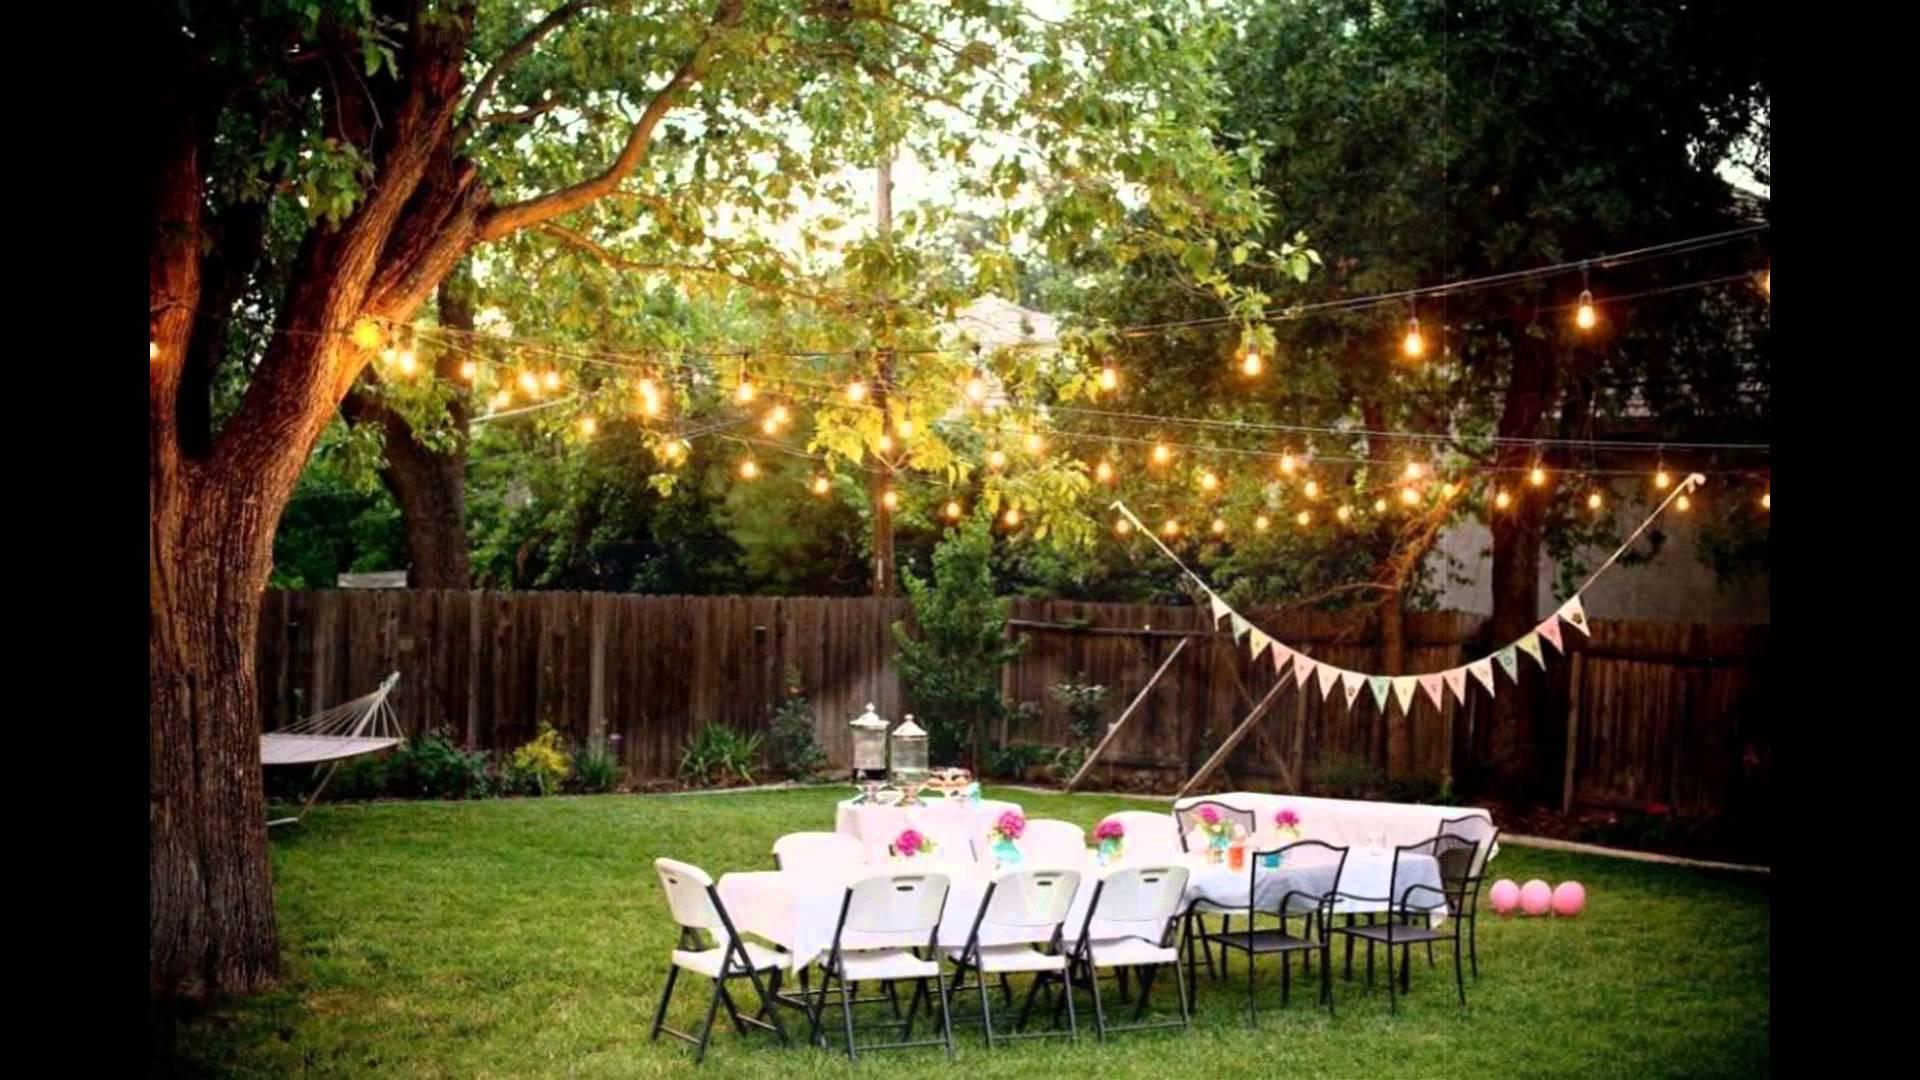 Backyard Wedding Receptions  Wedding Trends Archives Chicago Wedding Blog